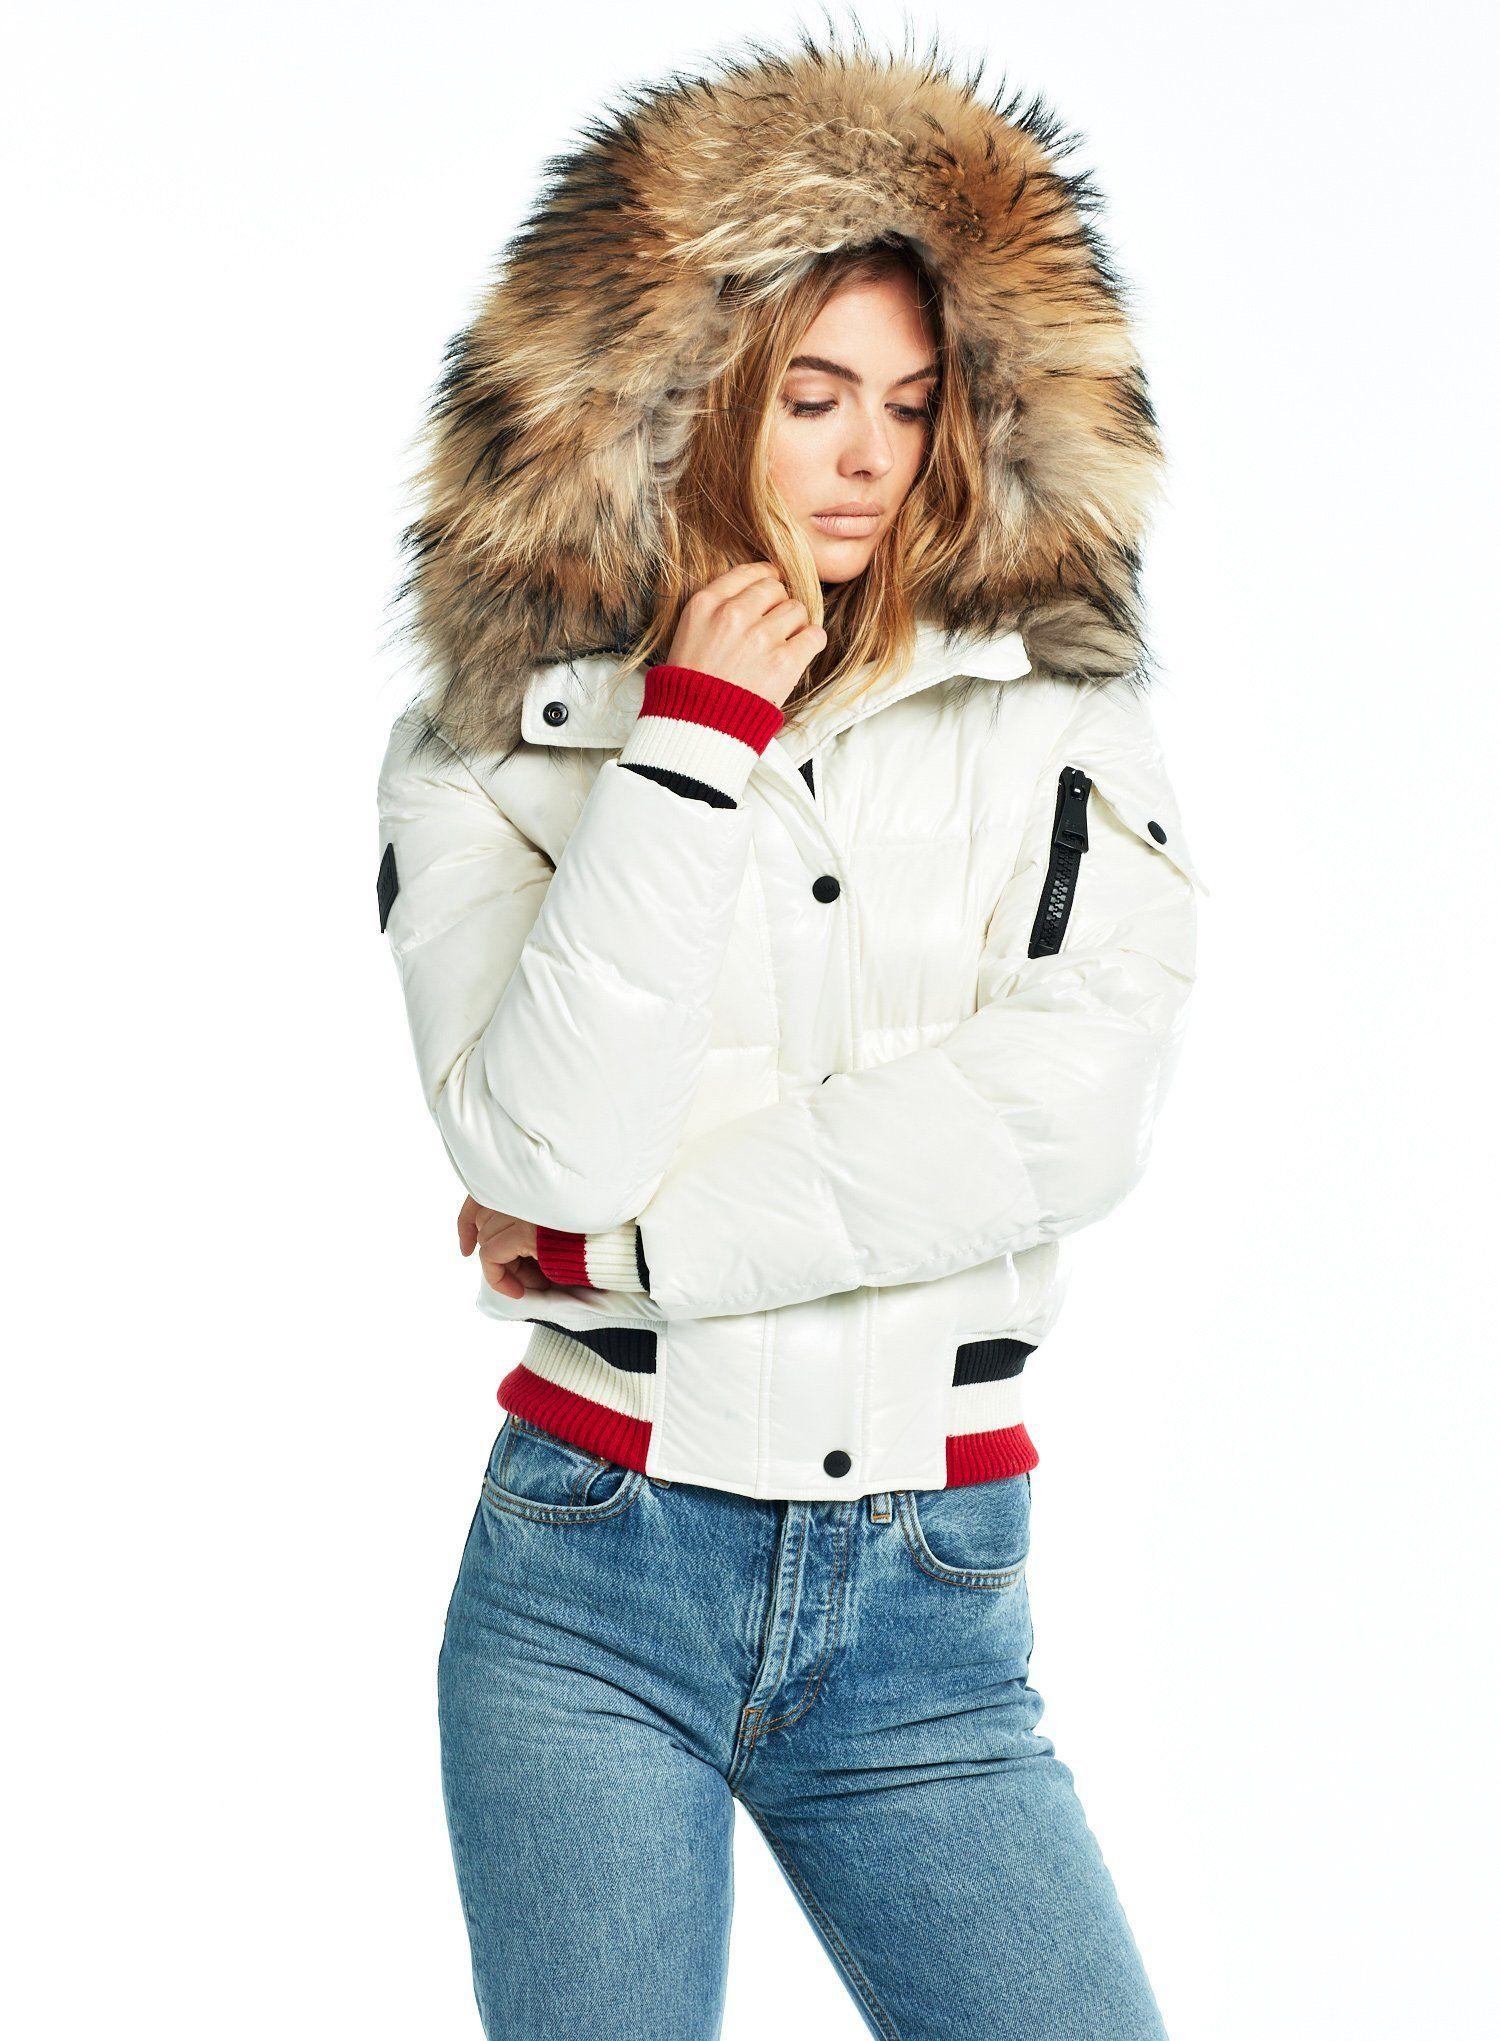 Sasha Sam Luxury Outerwear Jackets For Women Jackets [ 2041 x 1500 Pixel ]